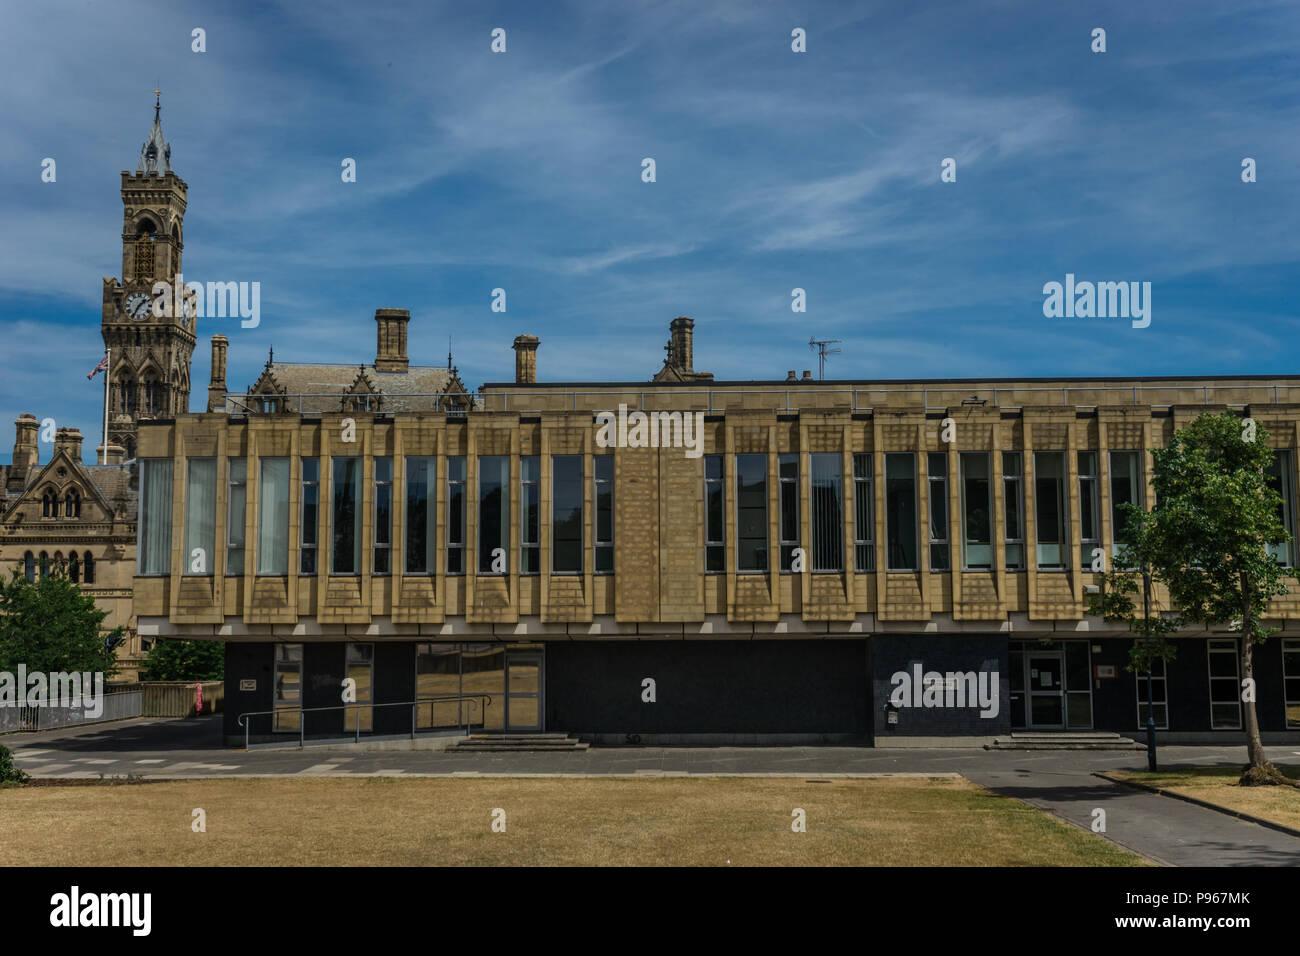 Bradford magistrates court - Stock Image